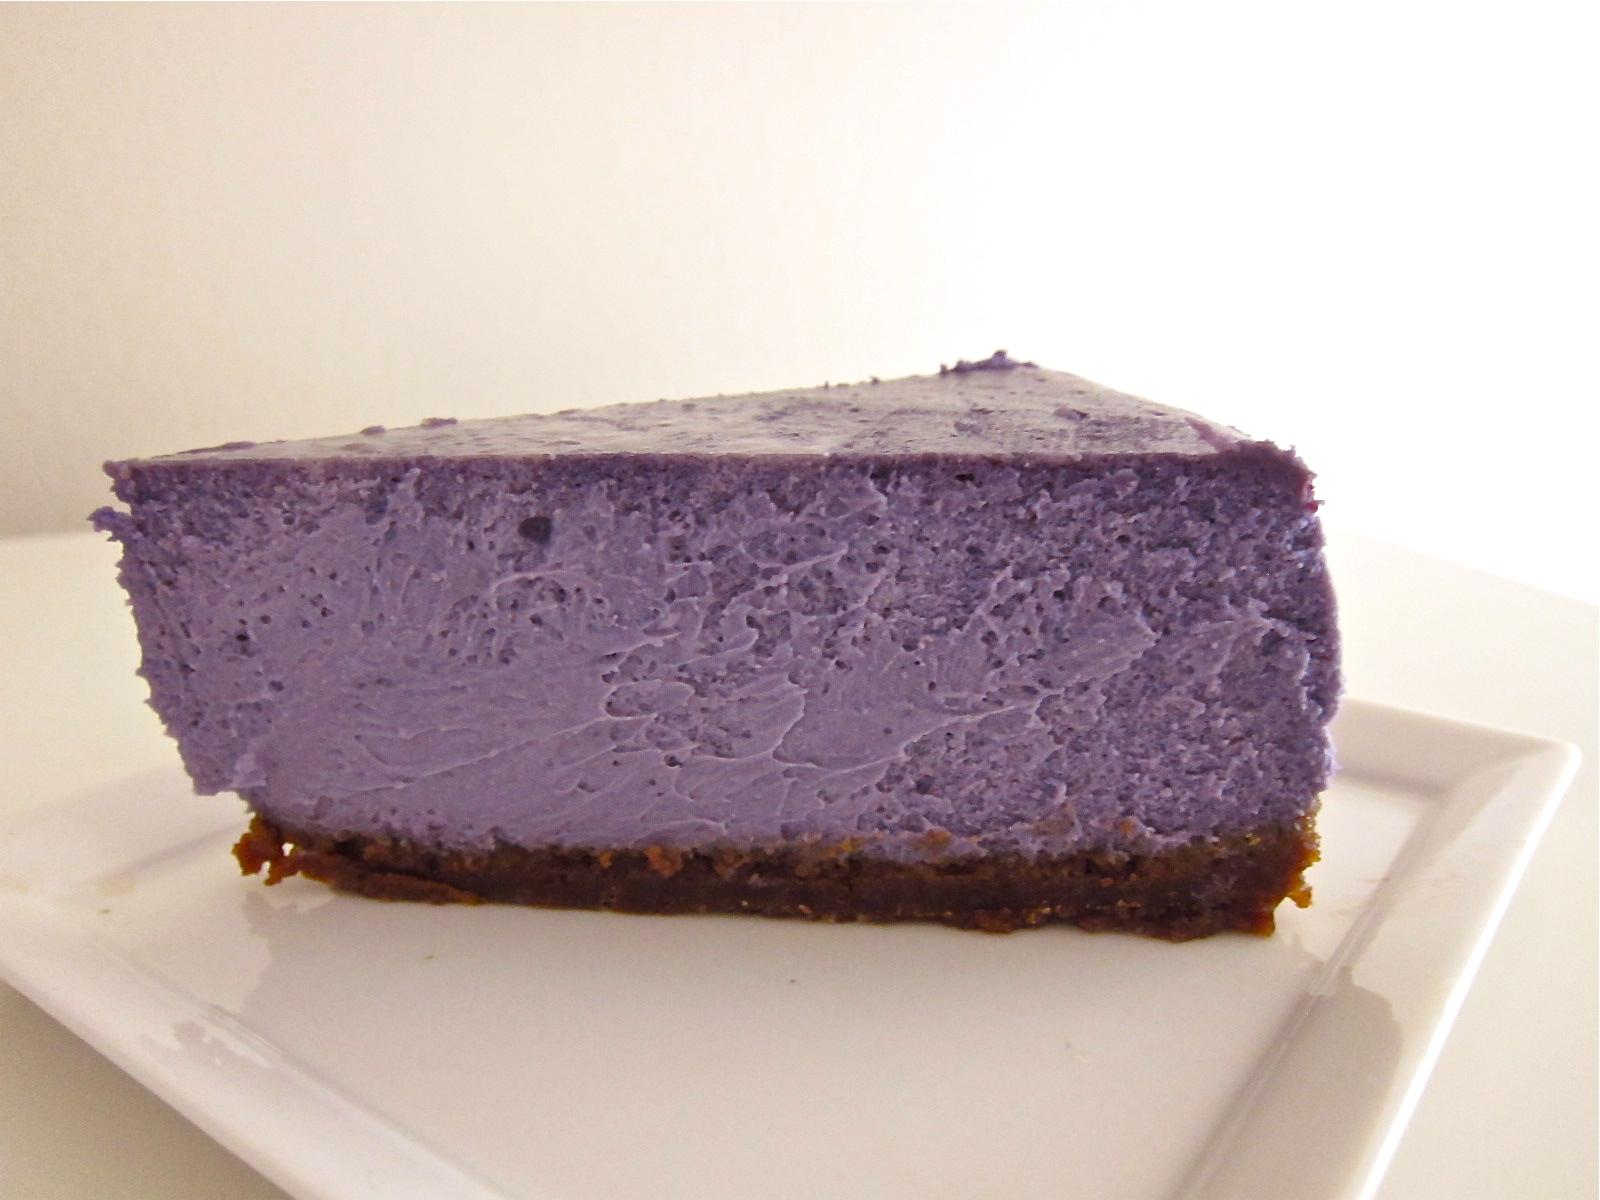 What Does Taro Cake Taste Like